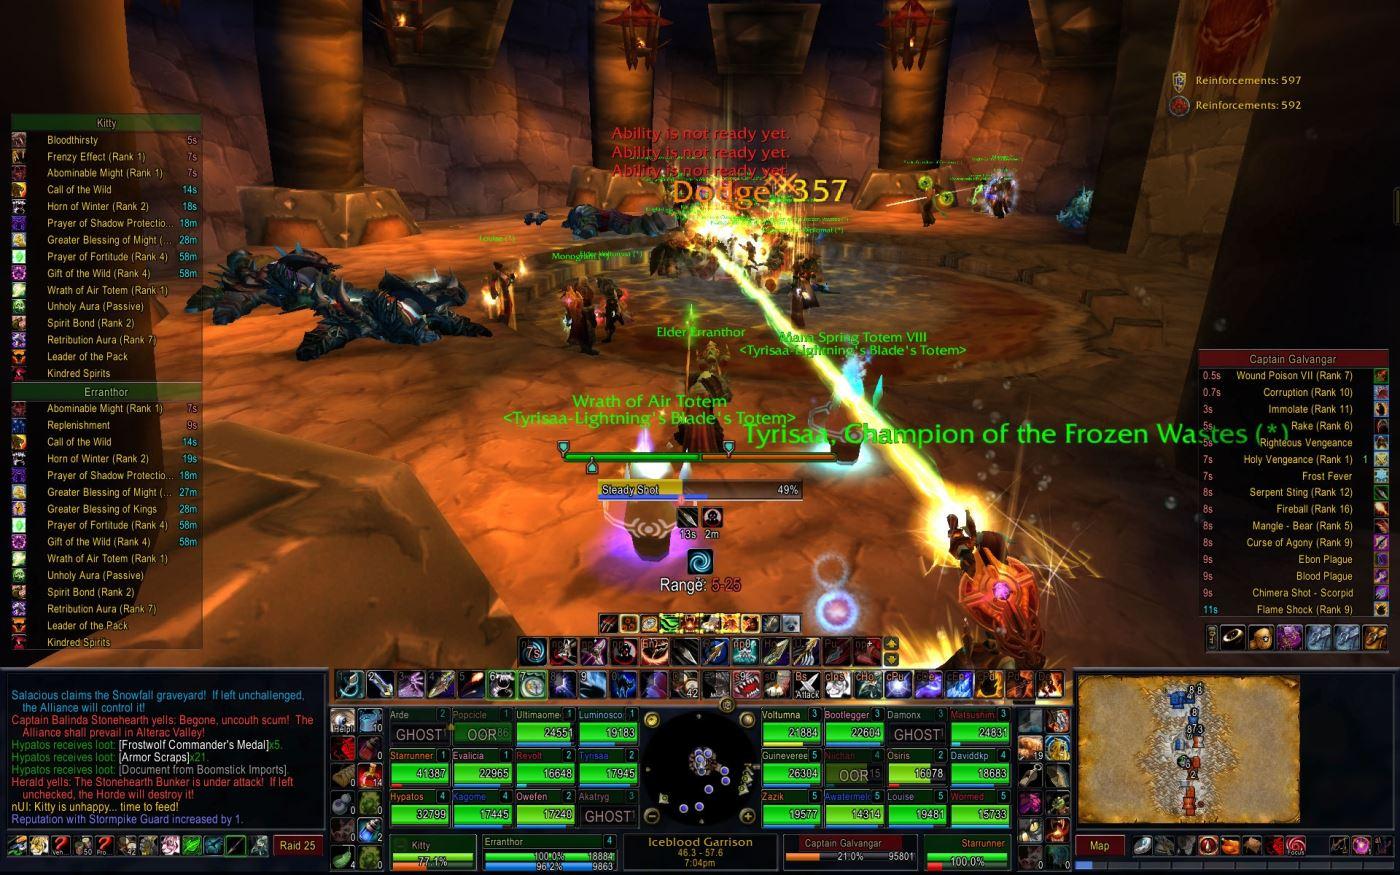 World of Warcraft UI